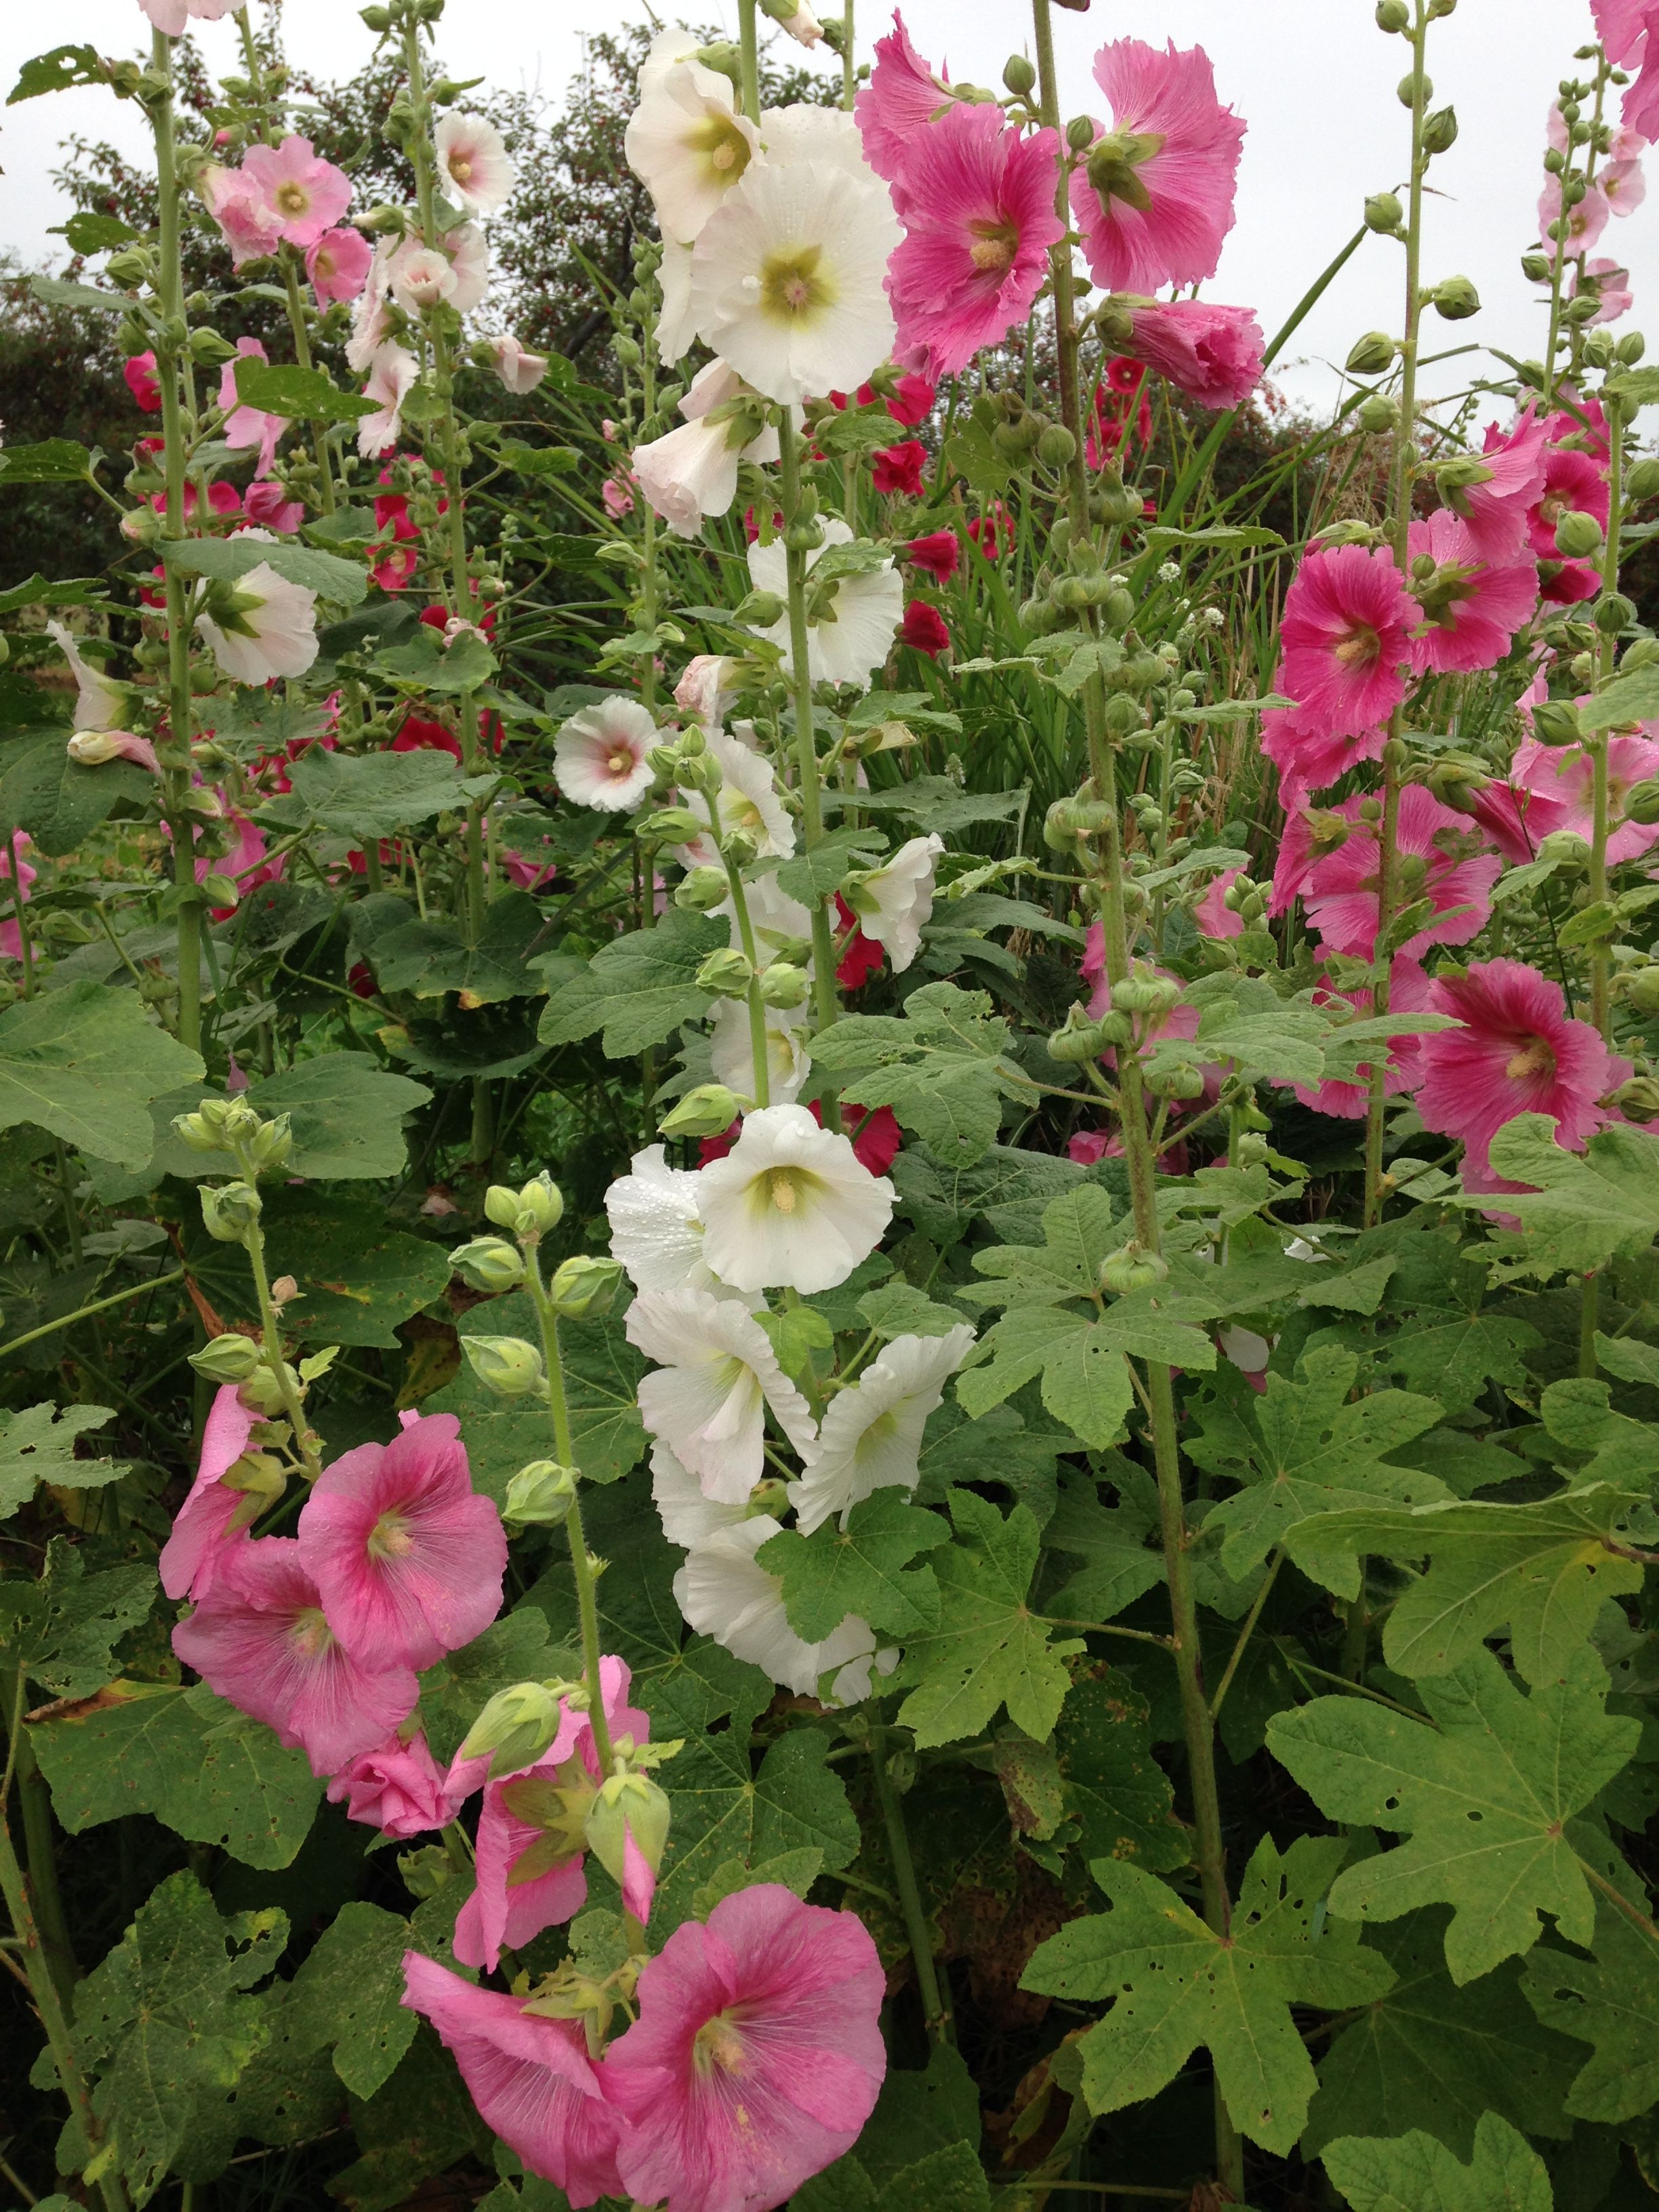 Pin by Robbin Bustance on Hollyhocks Hollyhock, Plants